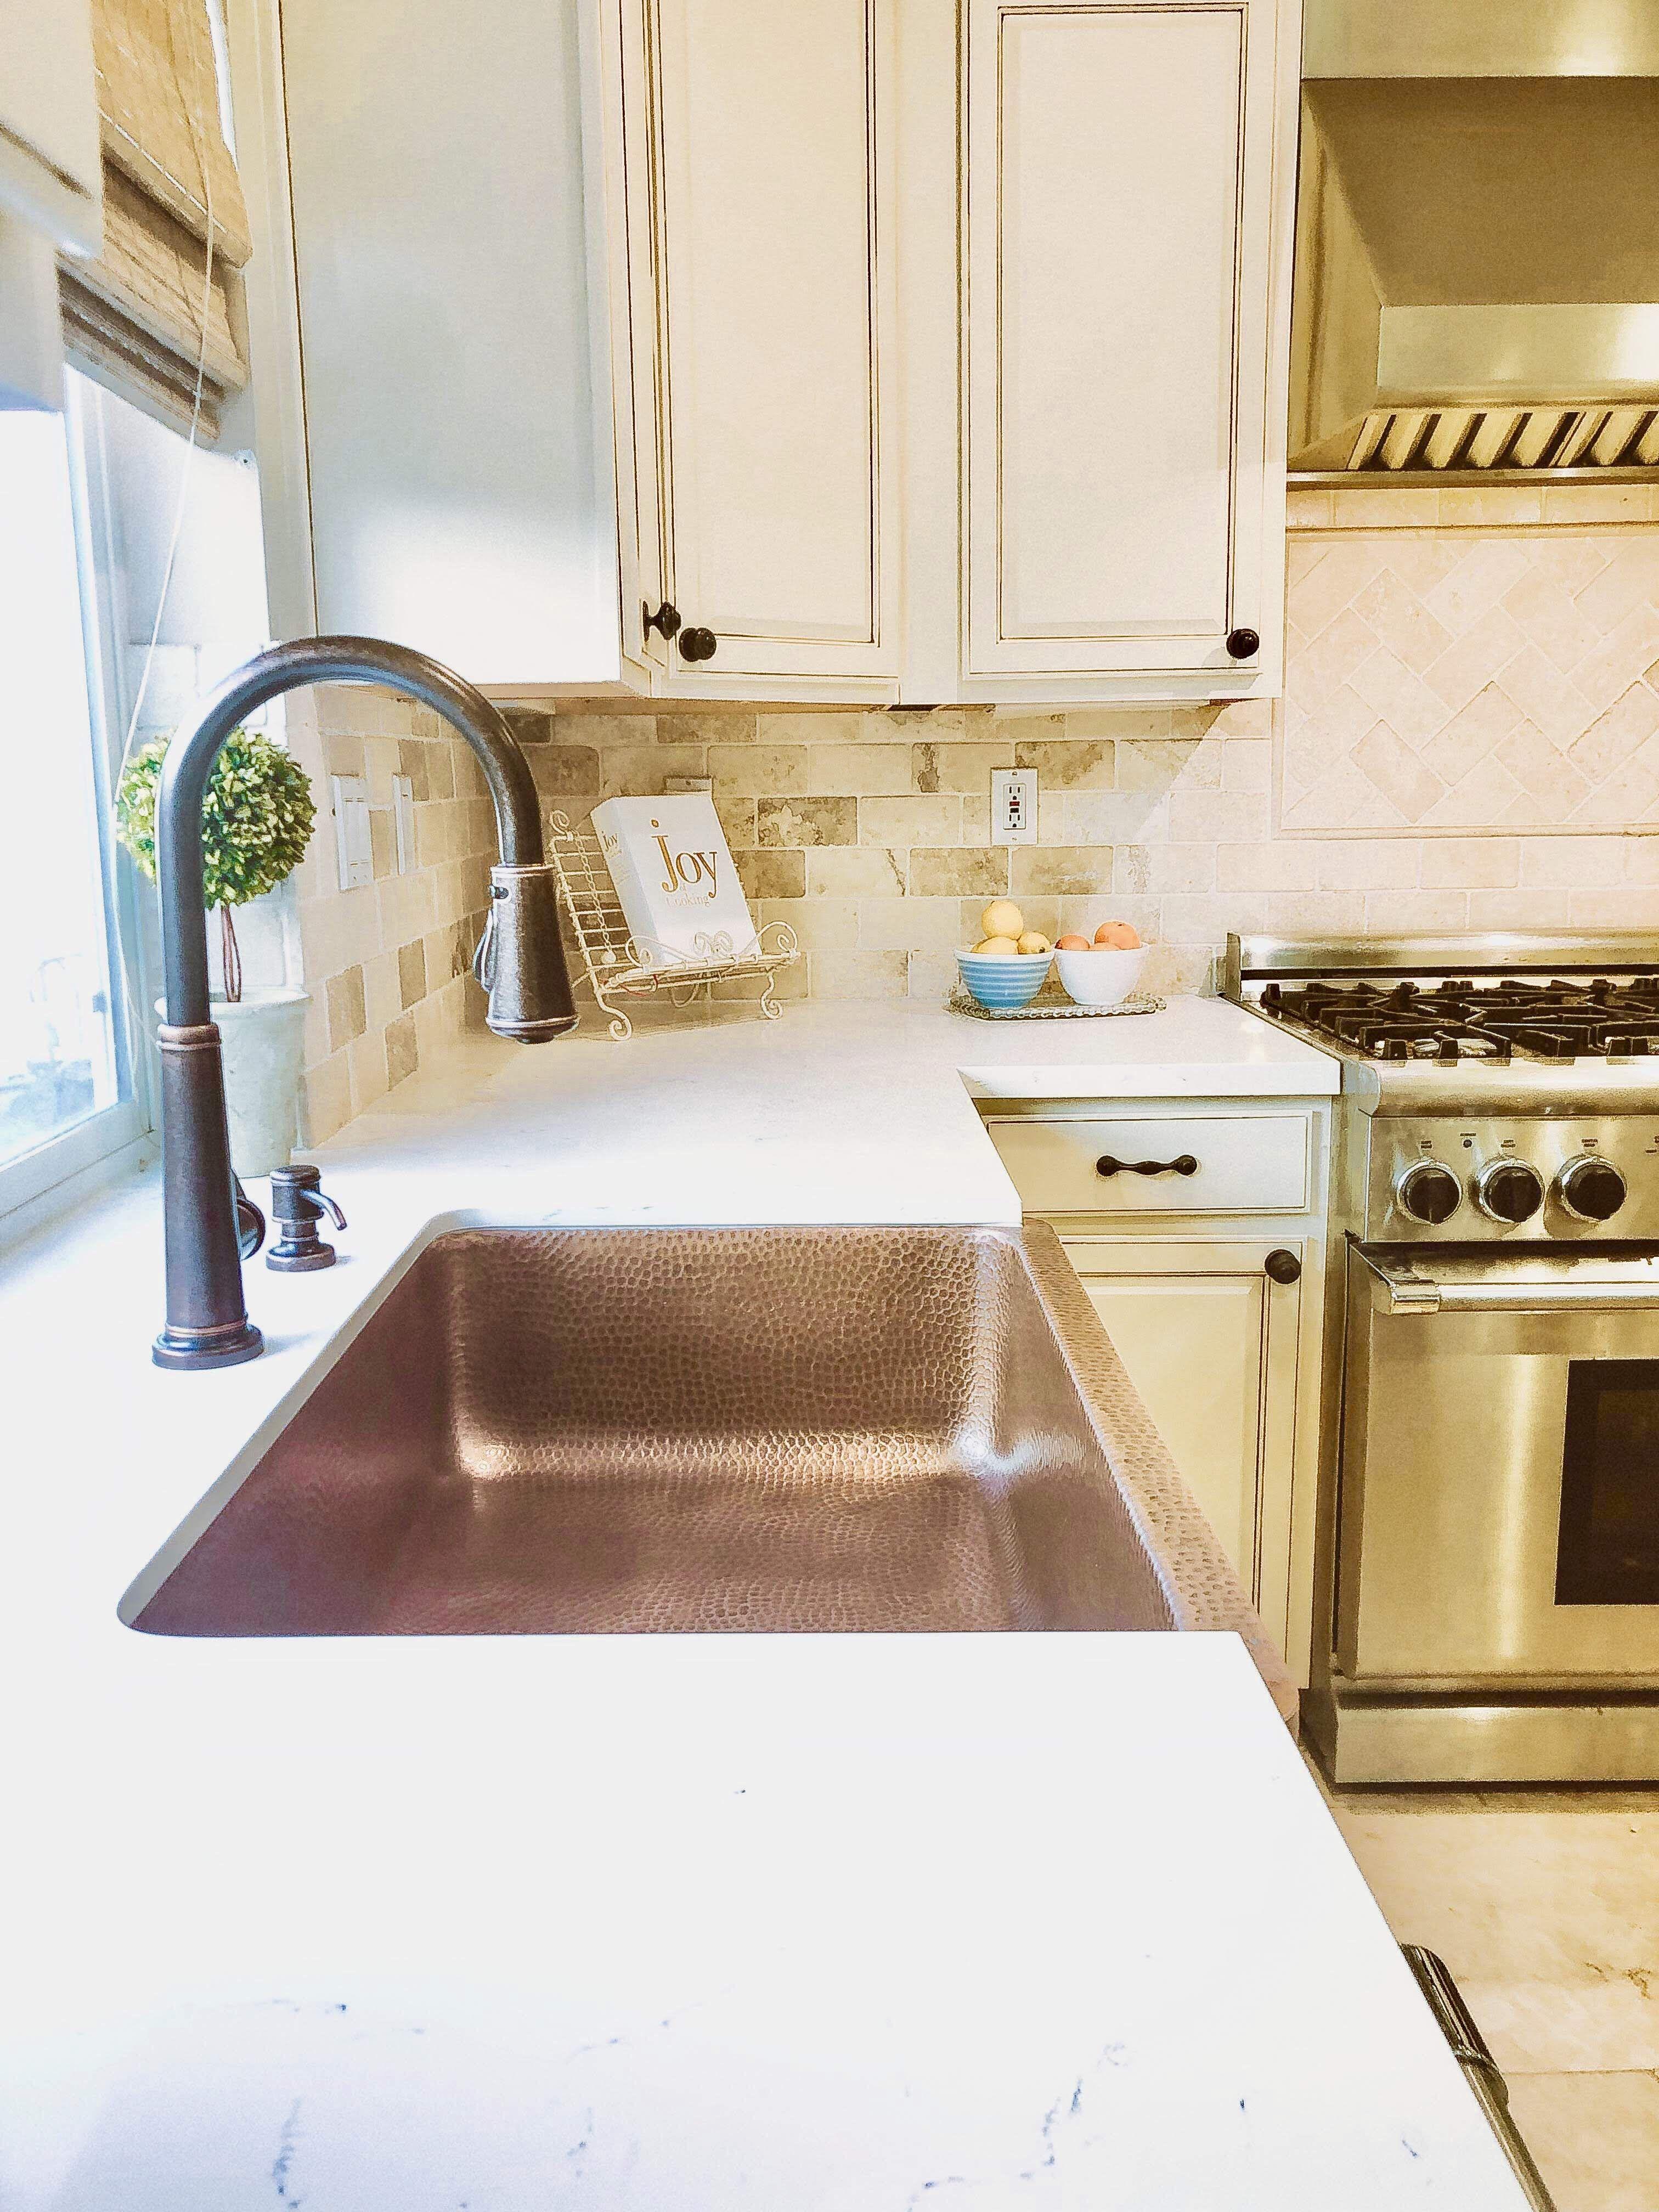 COPPER SINK REVIEW Sink, White farmhouse sink, Copper